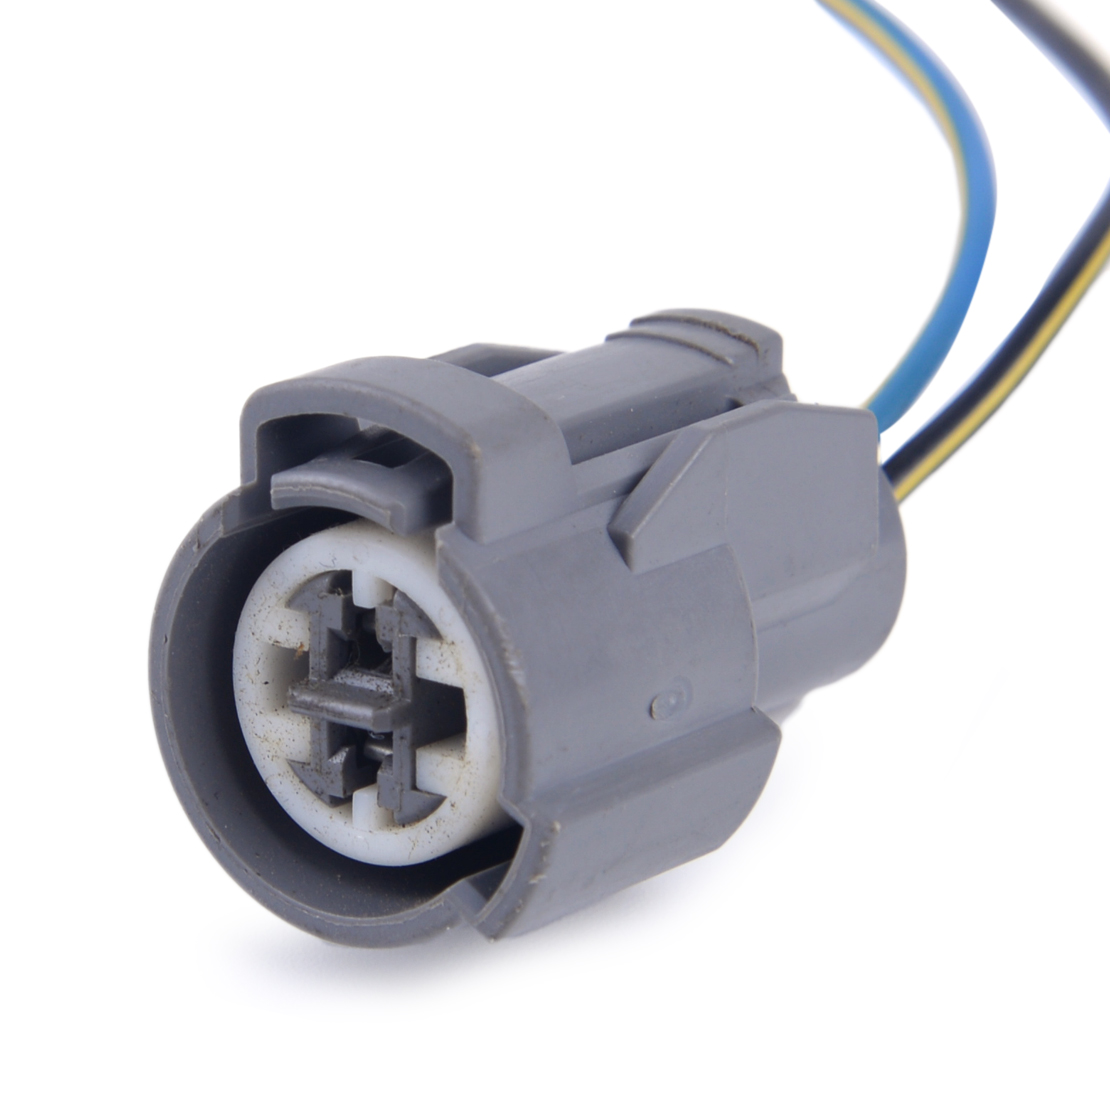 Engine Coolant Temperature Sensor Plug Fit For Honda